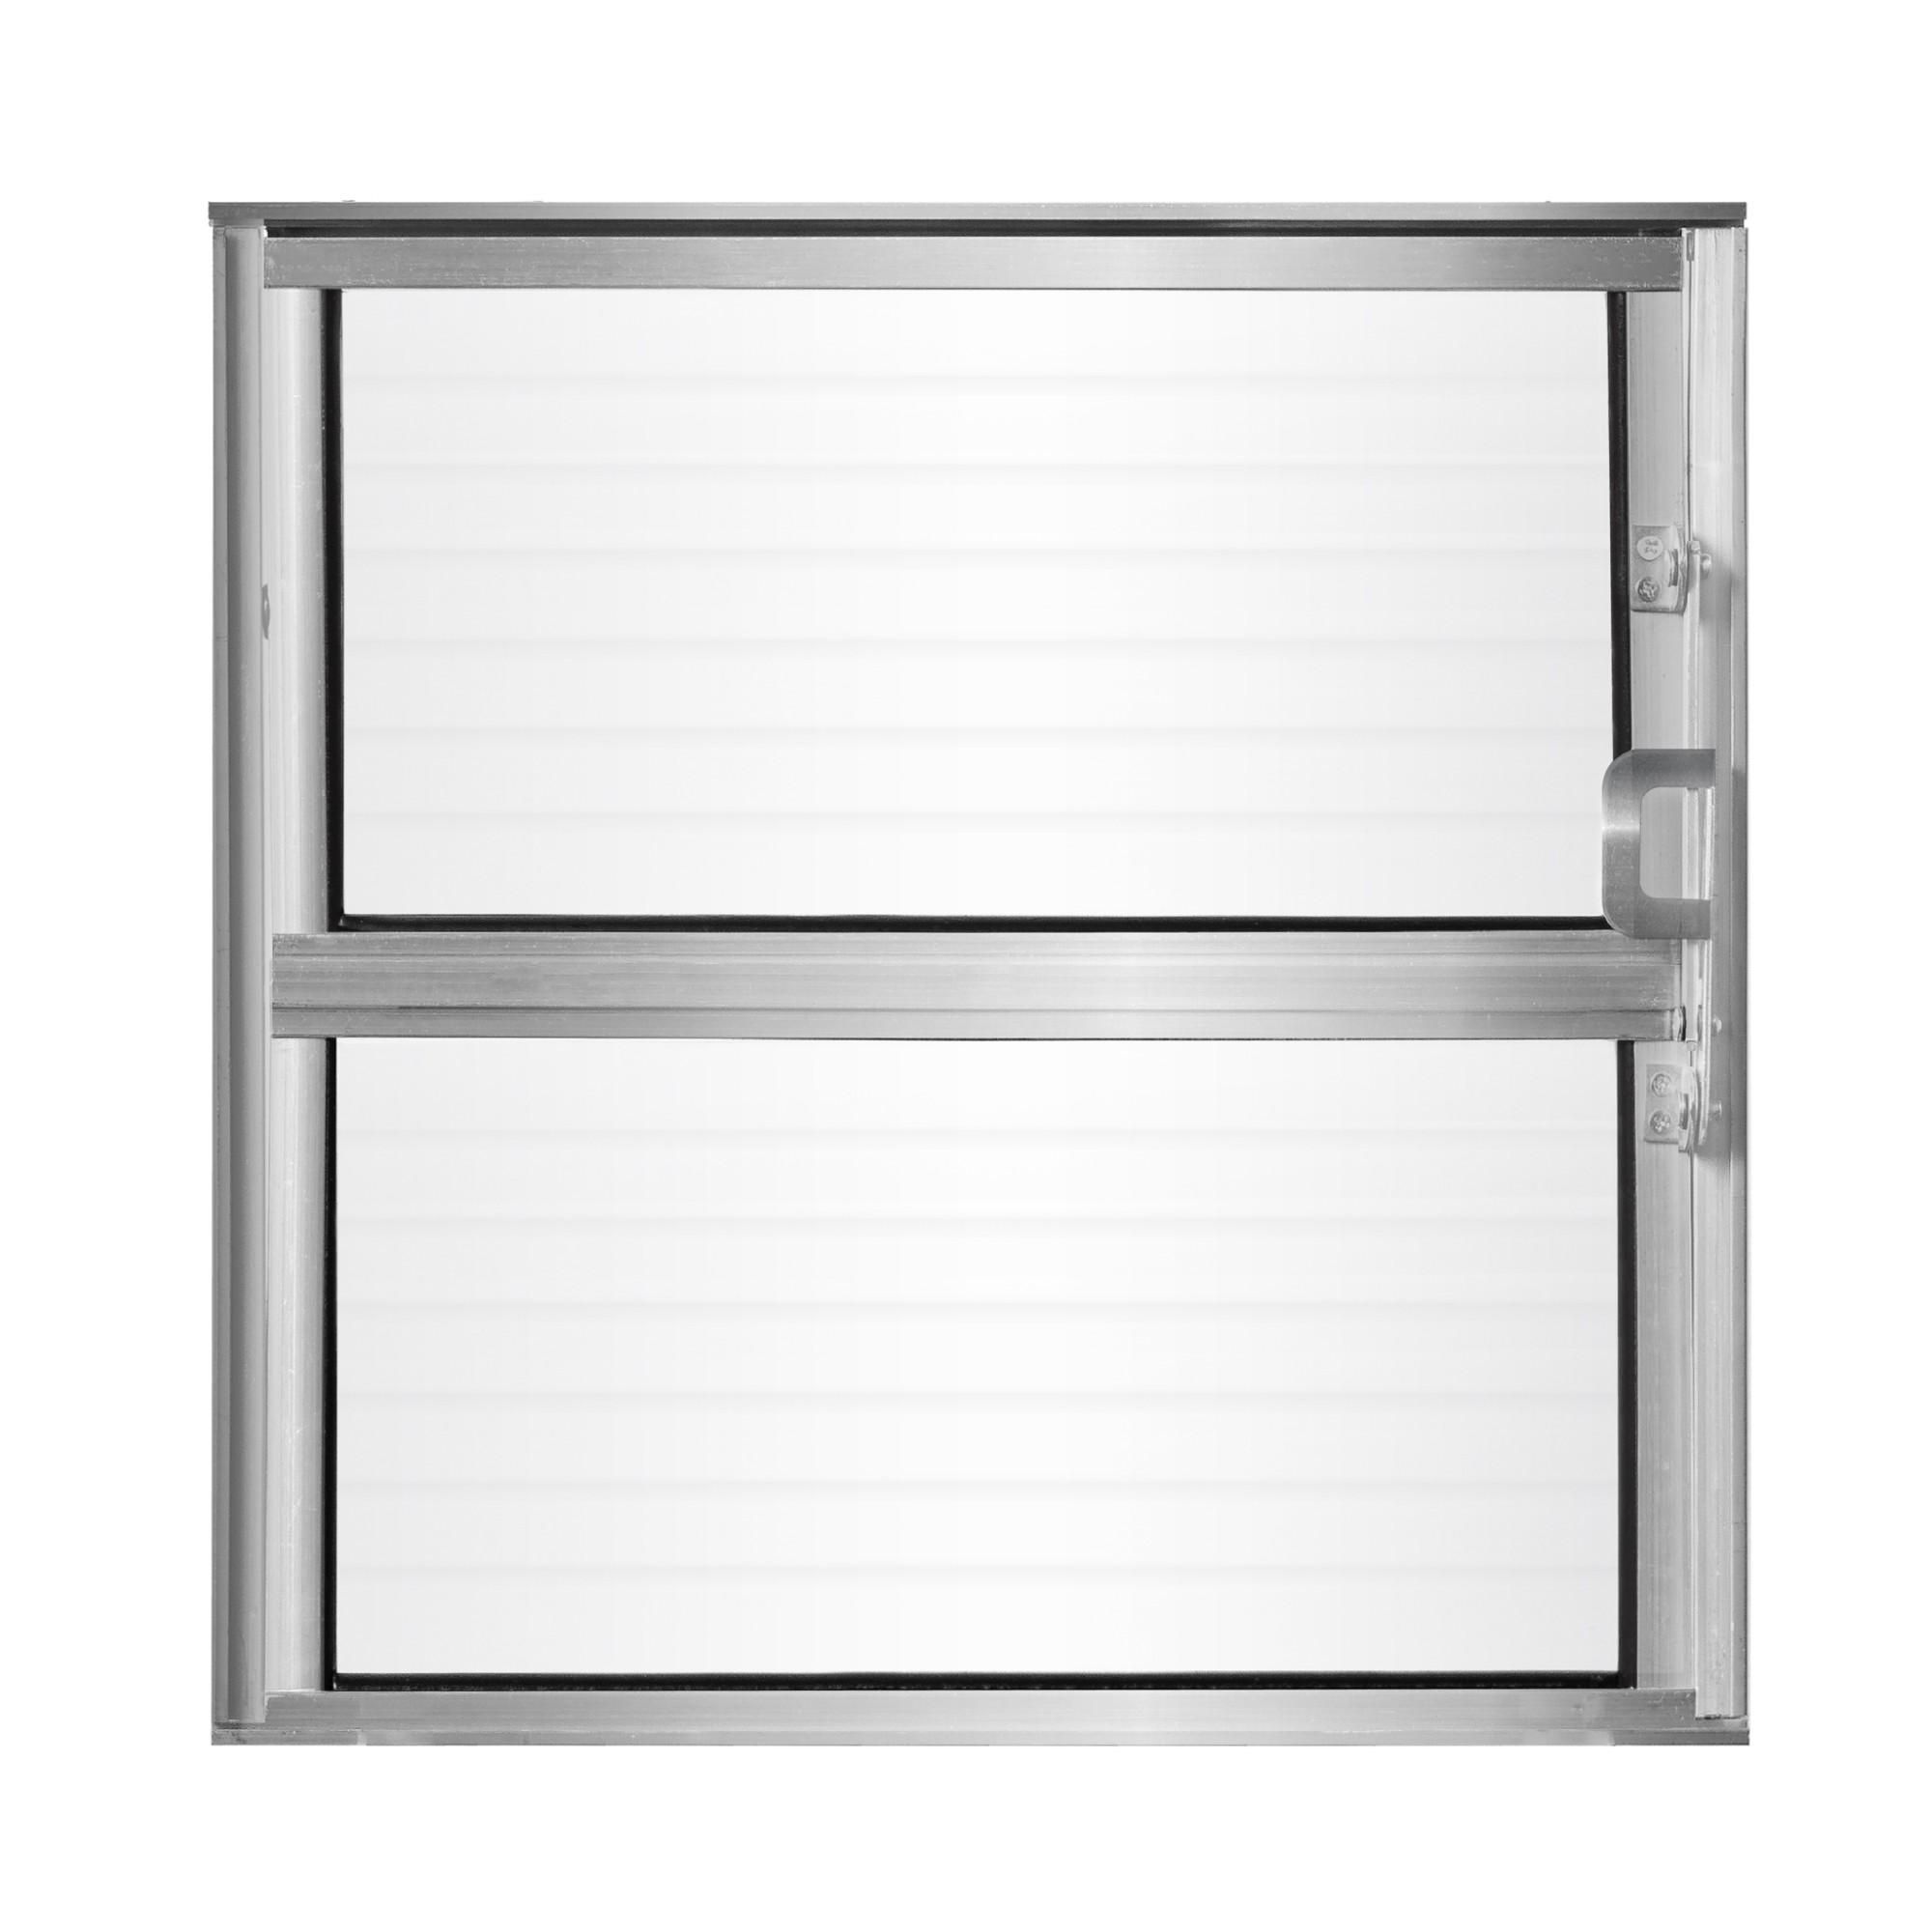 Janela de Abrir Basculante de Aluminio Vidro Canelado 40x40 cm Cinza - Aluvid